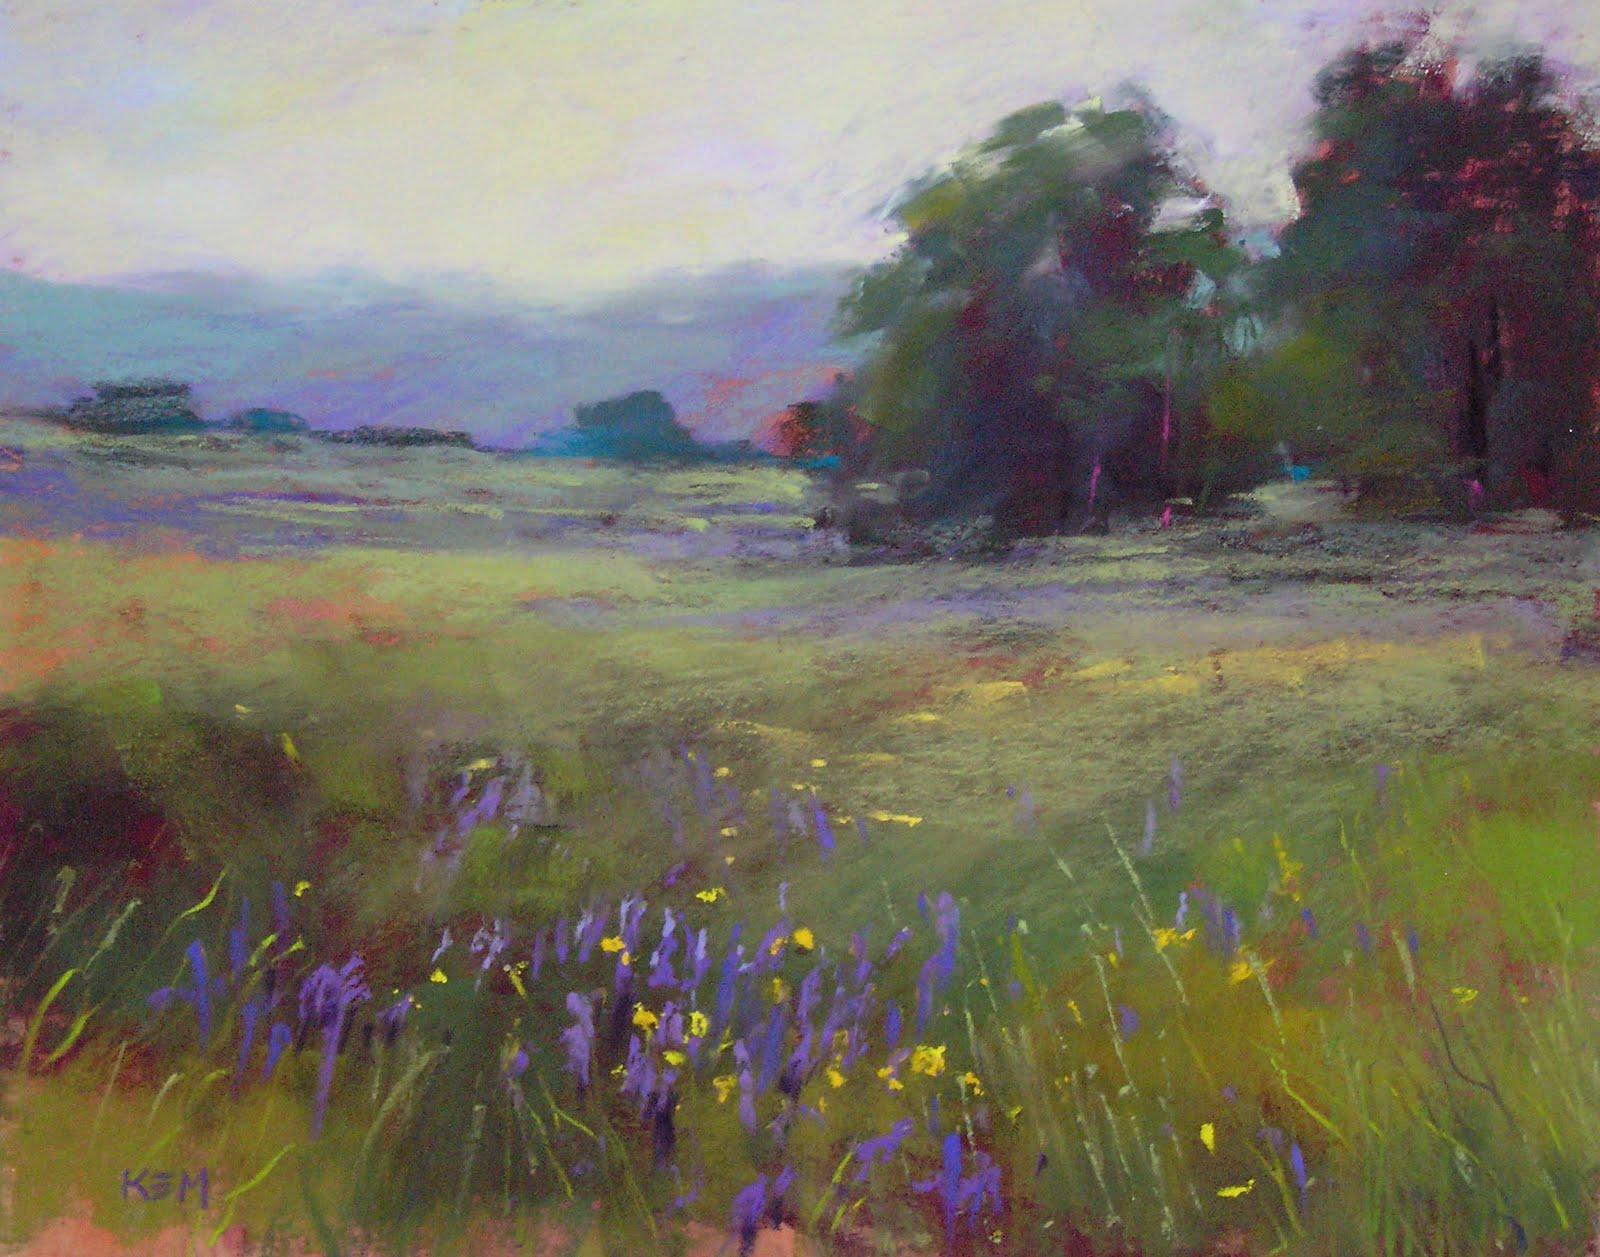 """Magical Meadows 11x14 pastel"" original fine art by Karen Margulis"